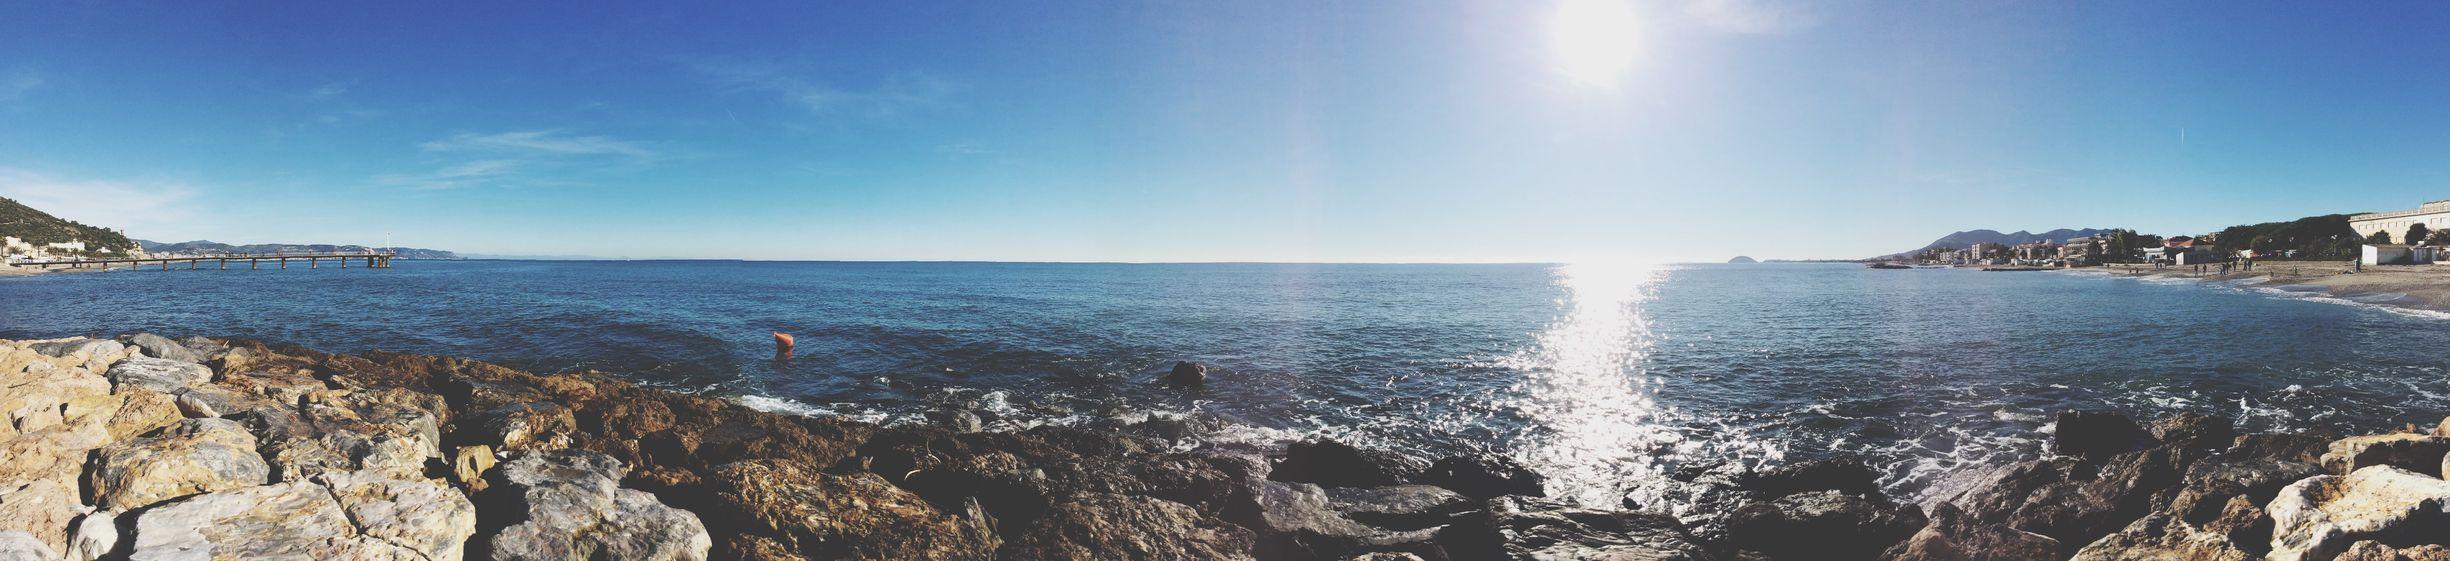 Taking Photos Sea Sunny Day sea and sky